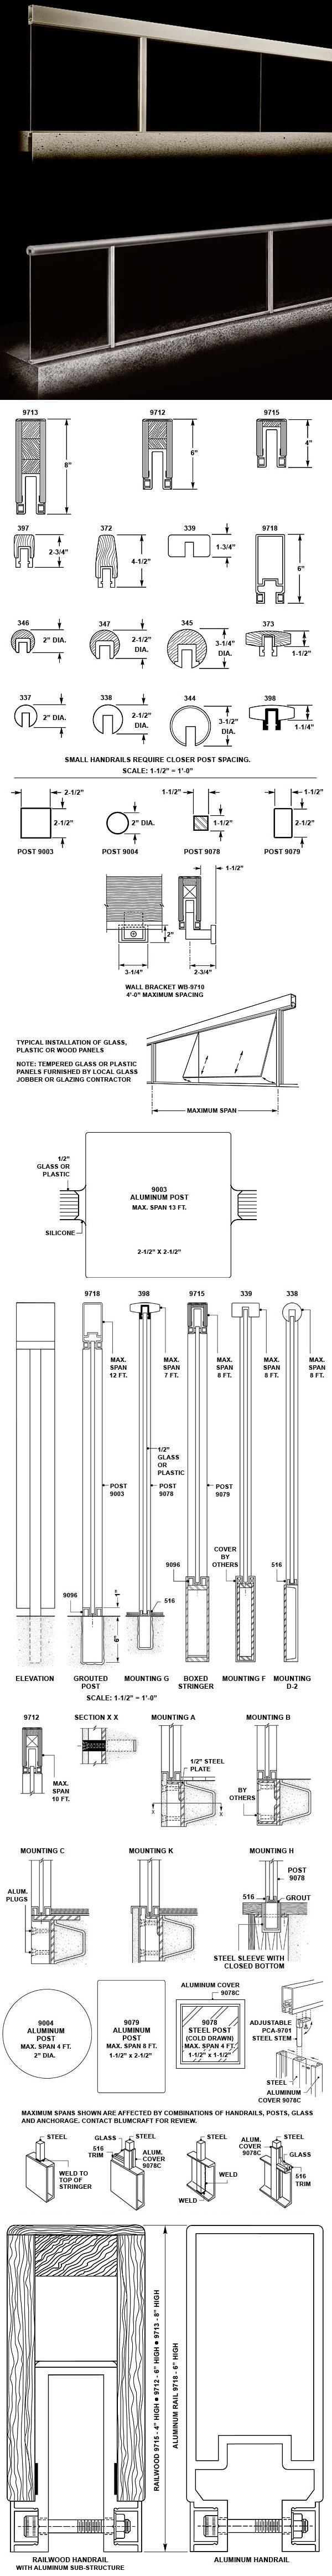 Panel Rail Series 9000